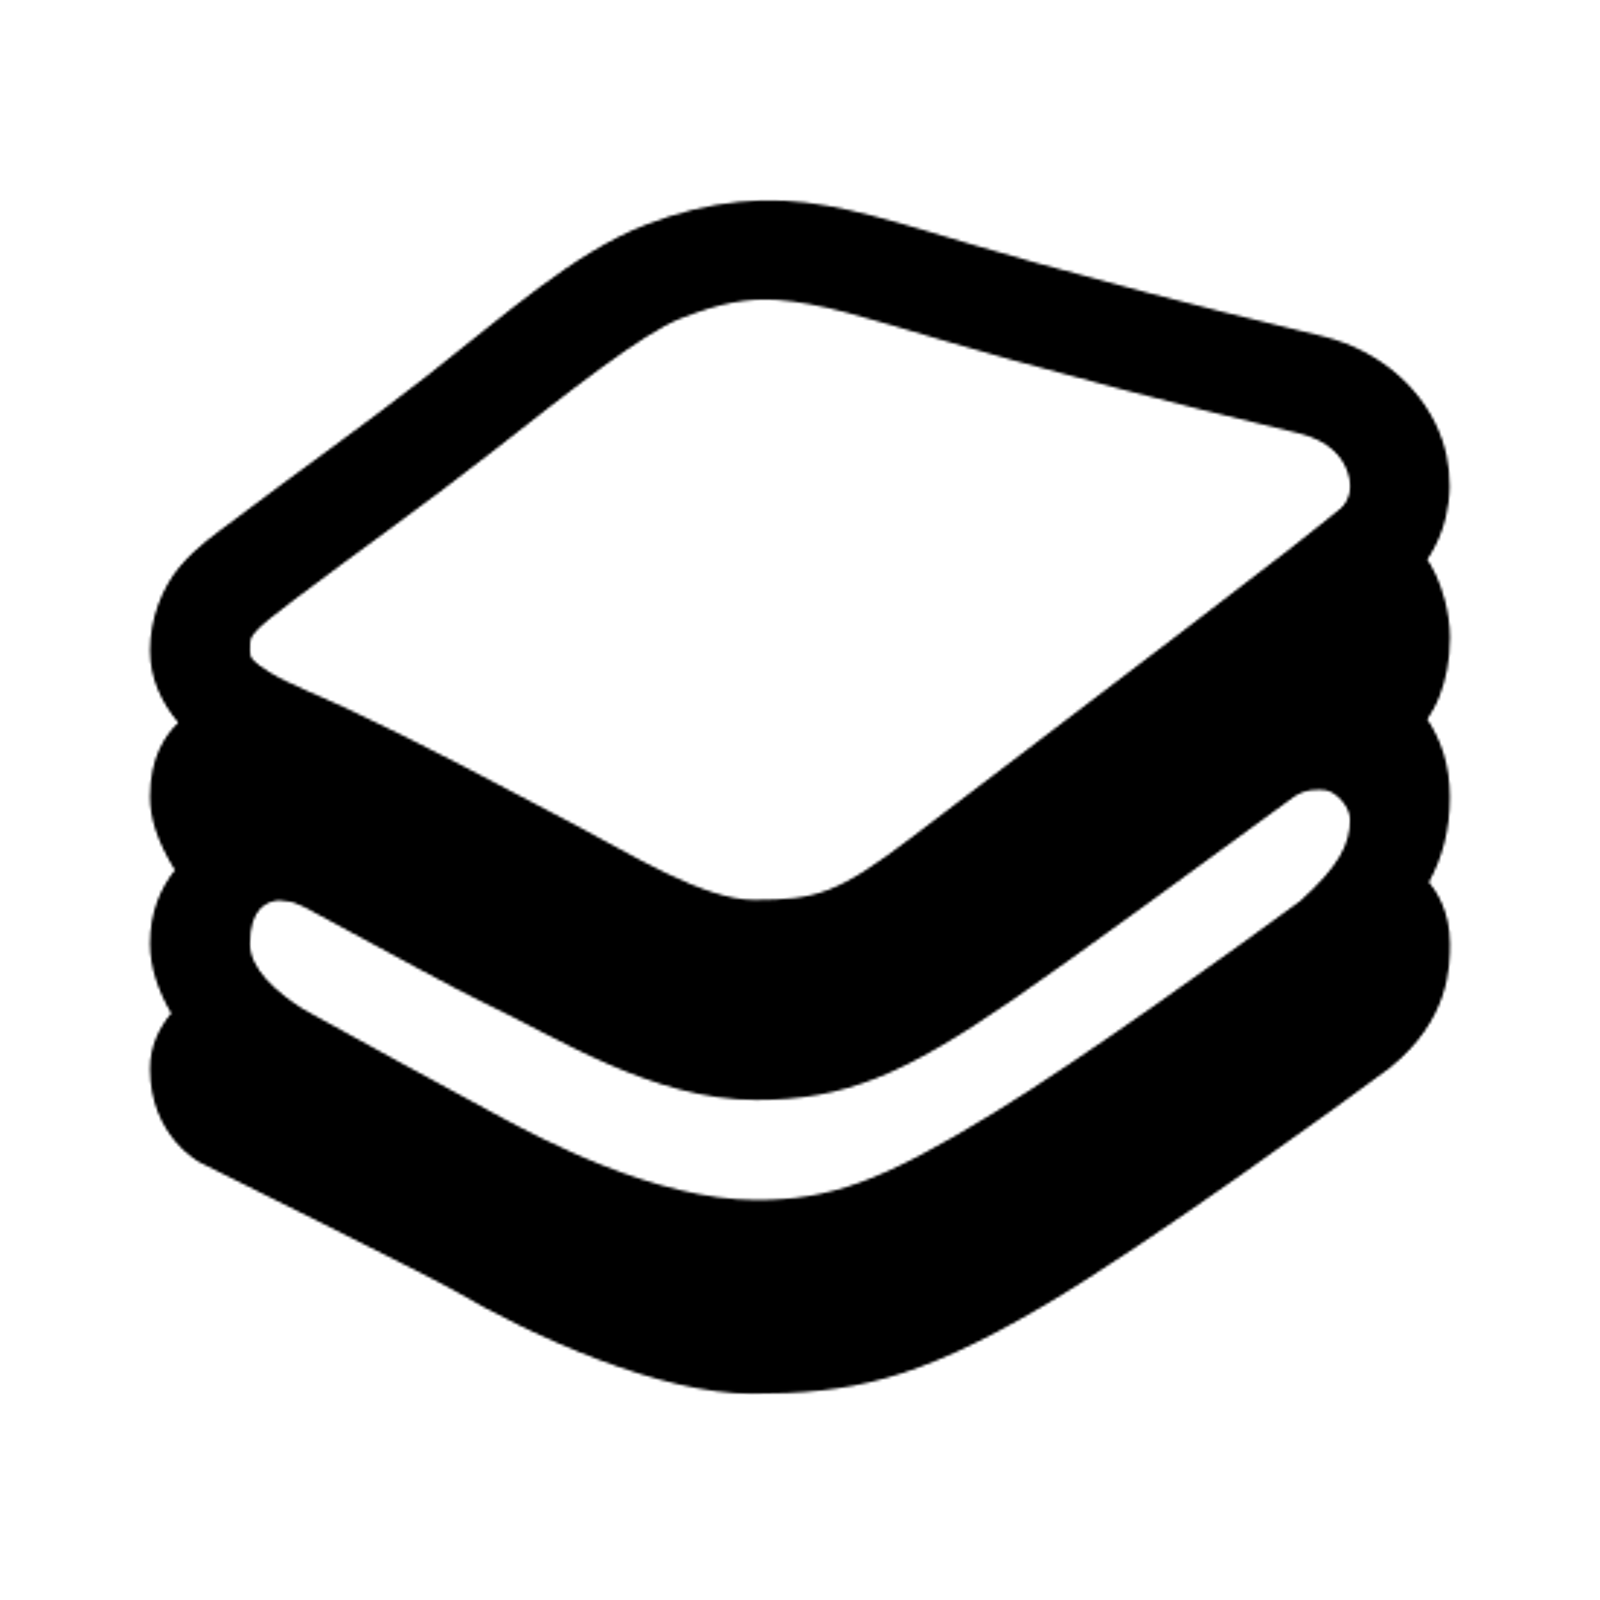 BlueStacks icon